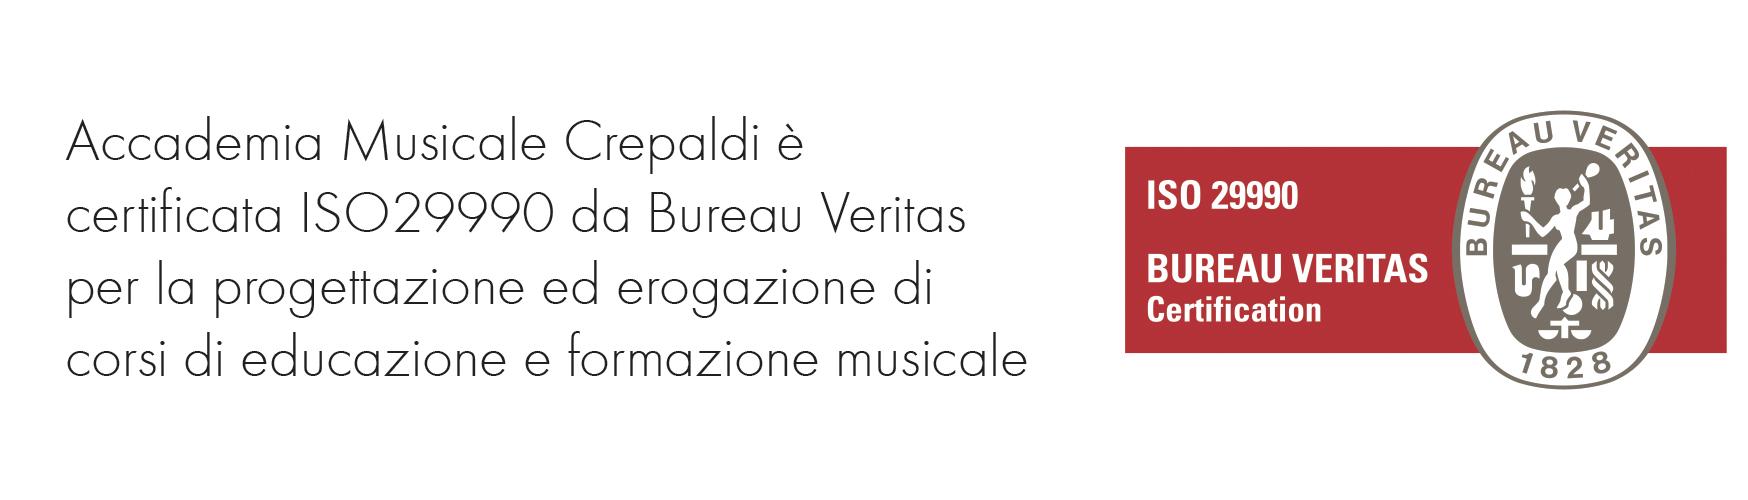 Accademia Musicale Crepaldi è certificata ISO da Bureau Veritas